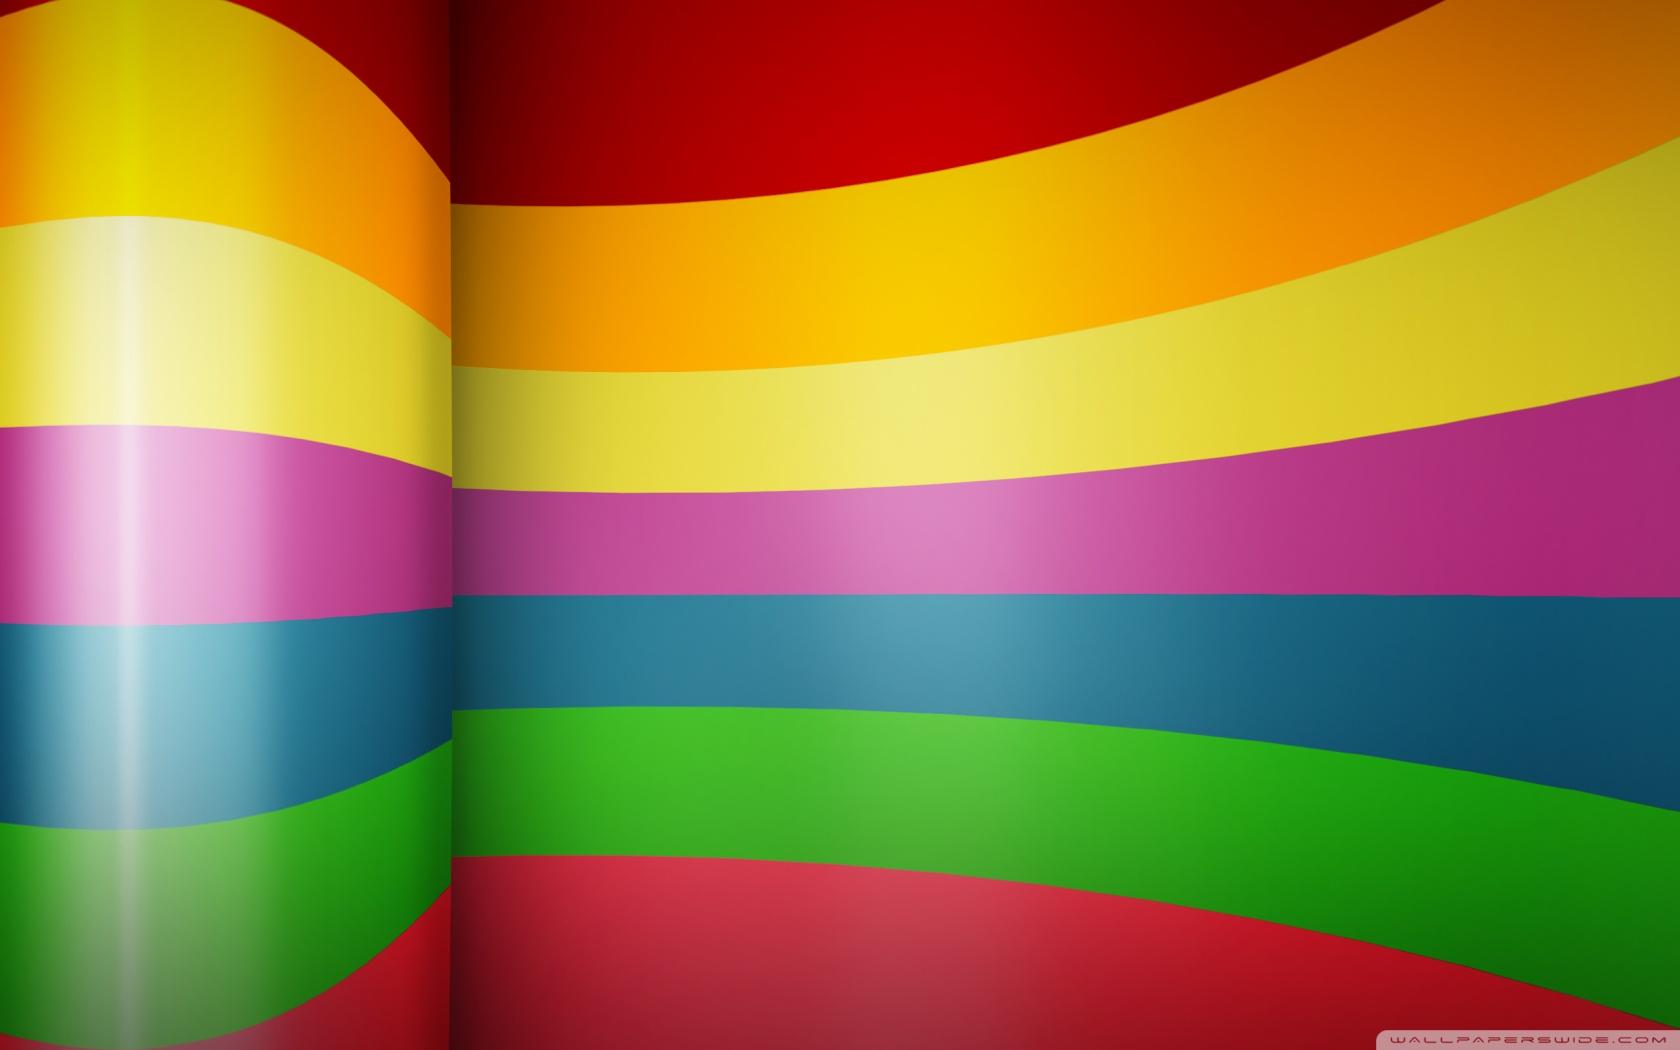 colors wallpaper - sf wallpaper